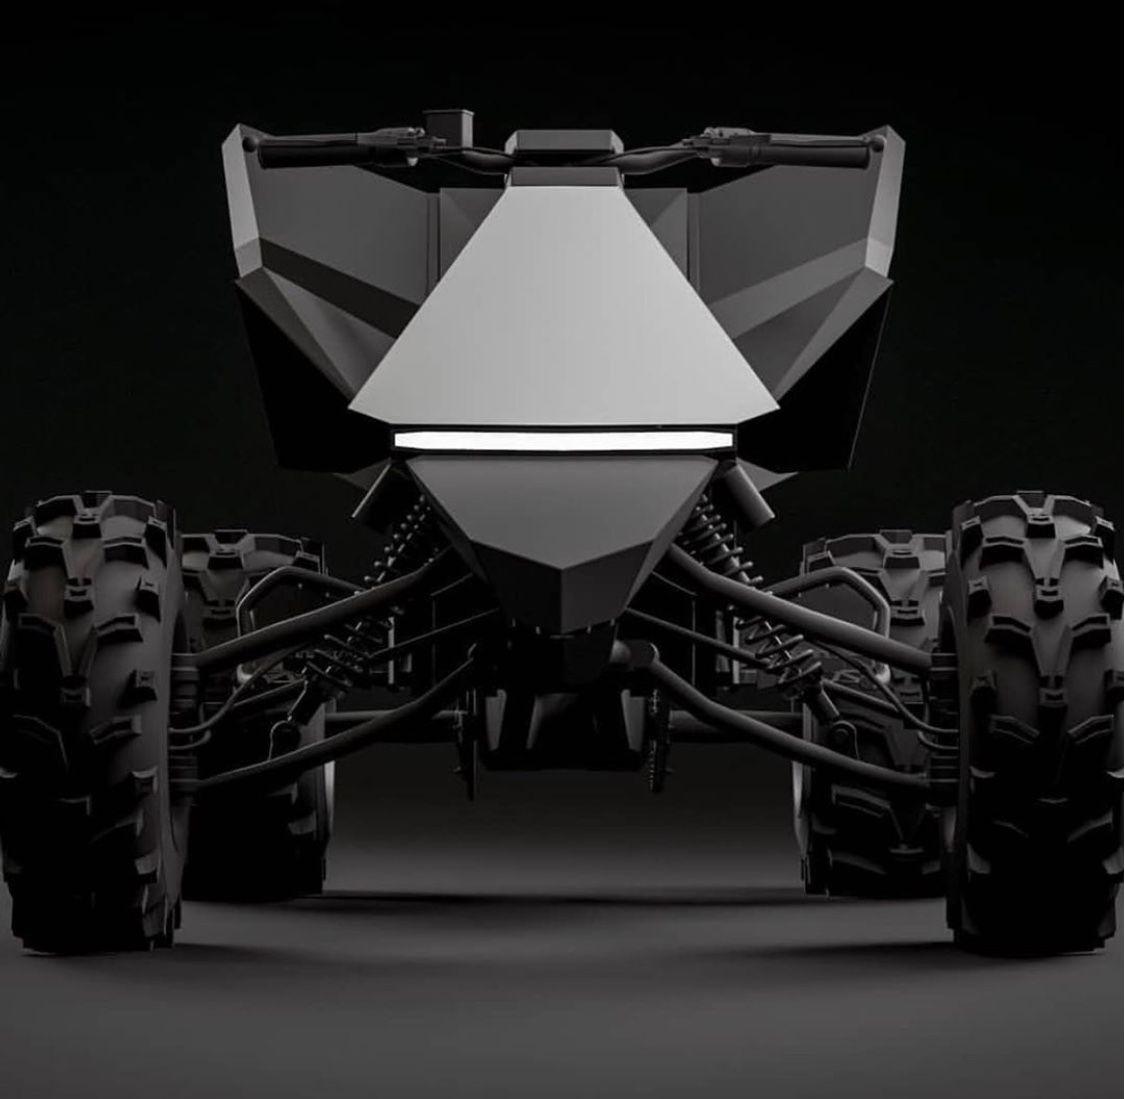 The Tesla Atv Is Beyond Cool Slaylebrity Tesla Atv Electric Dirt Bike